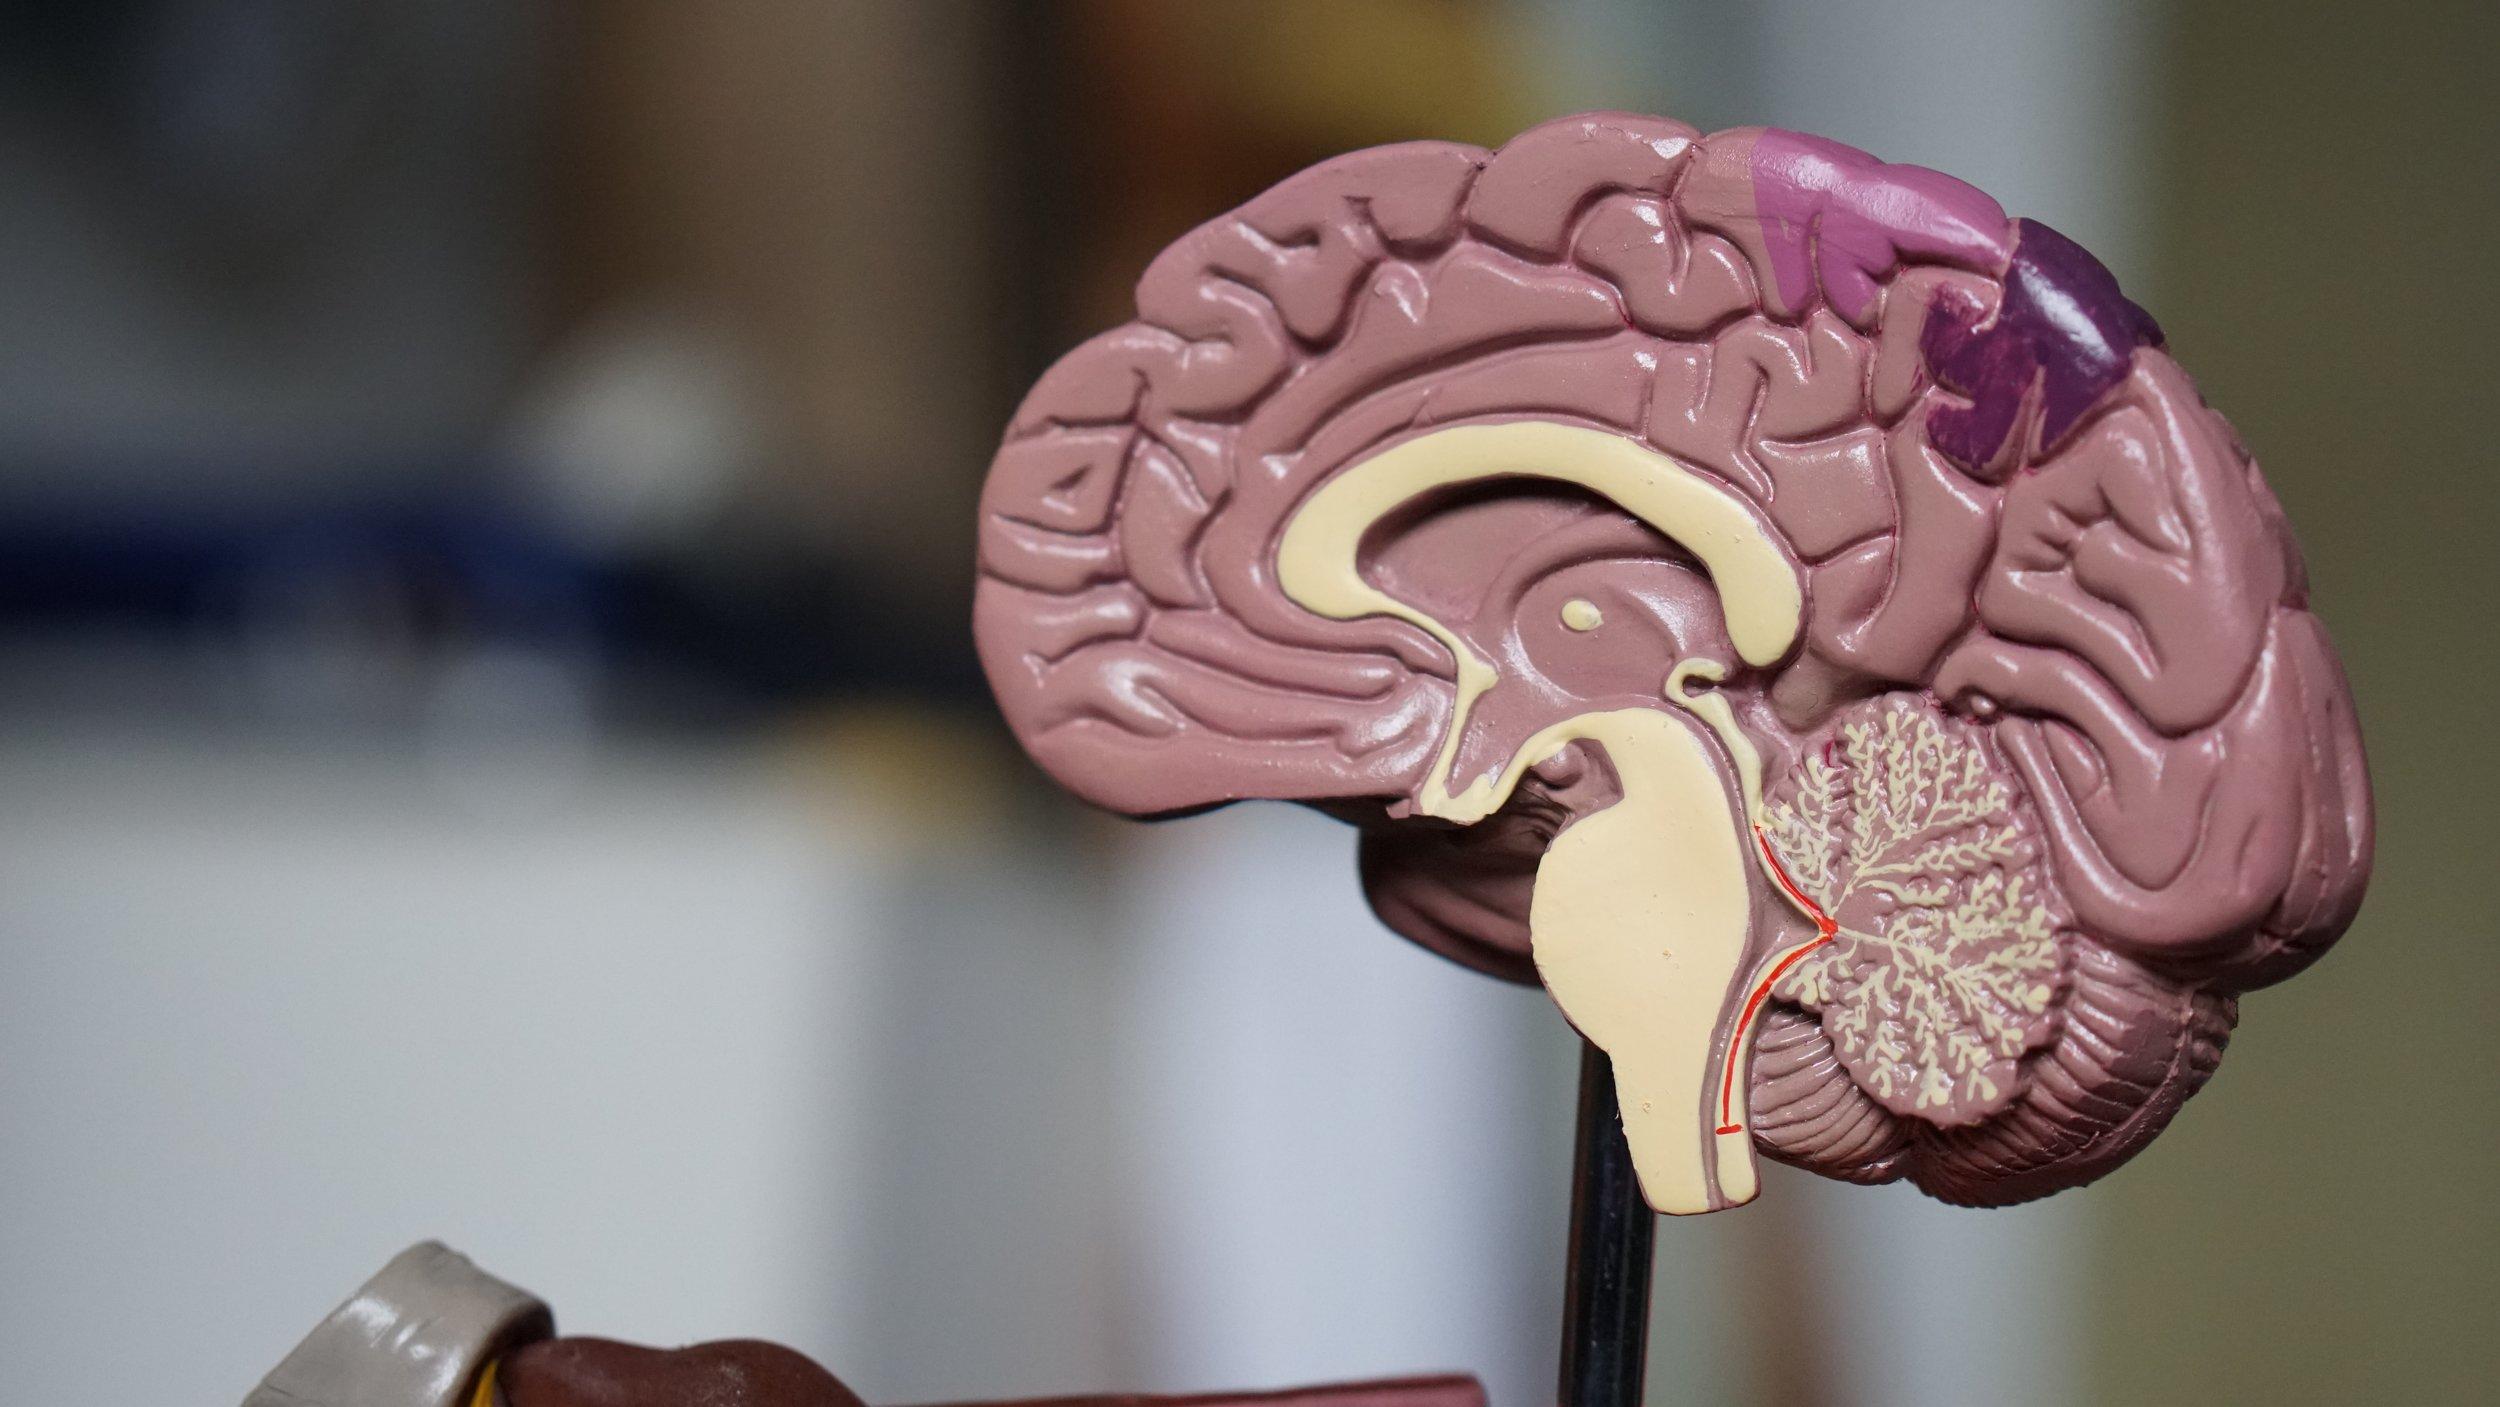 A scientific model of the human brain.